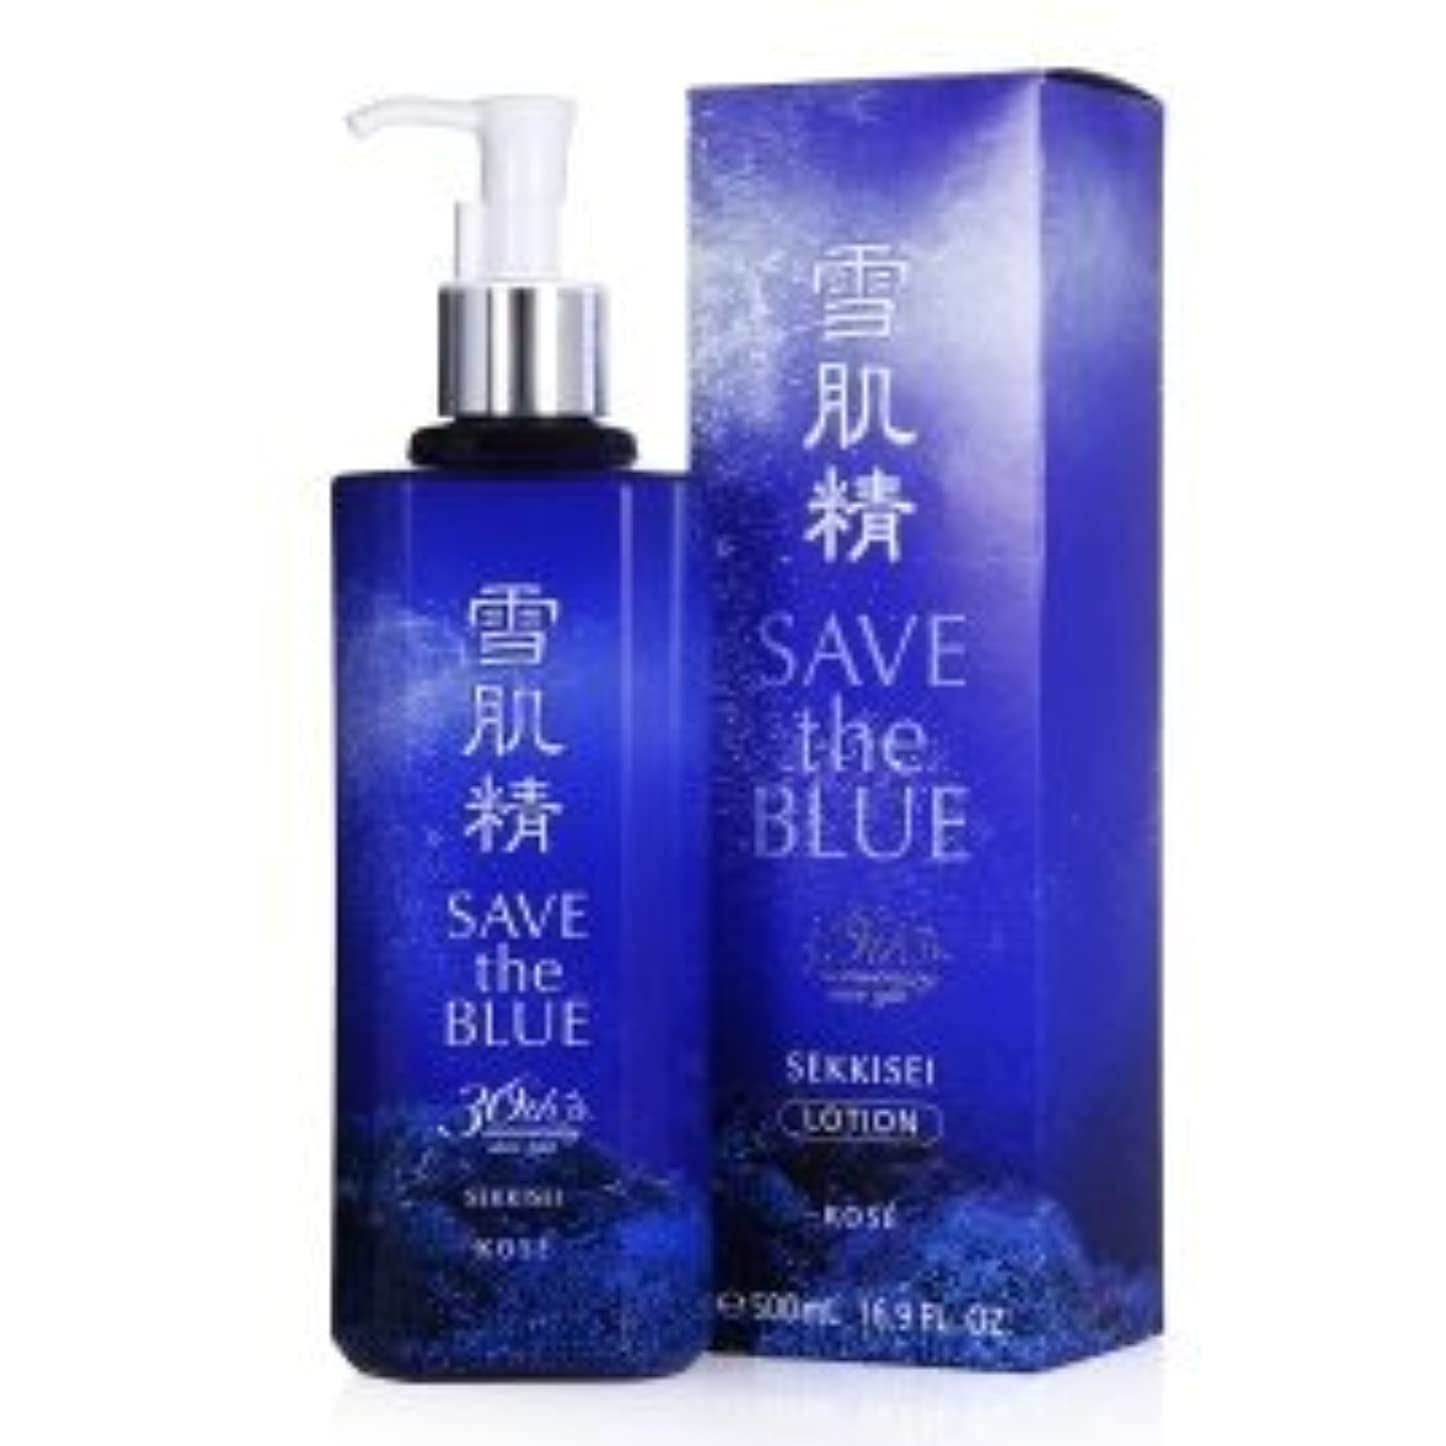 老人政治楽観的KOSE コーセー 薬用 雪肌精 化粧水 500ml 【SAVE the BLUE】